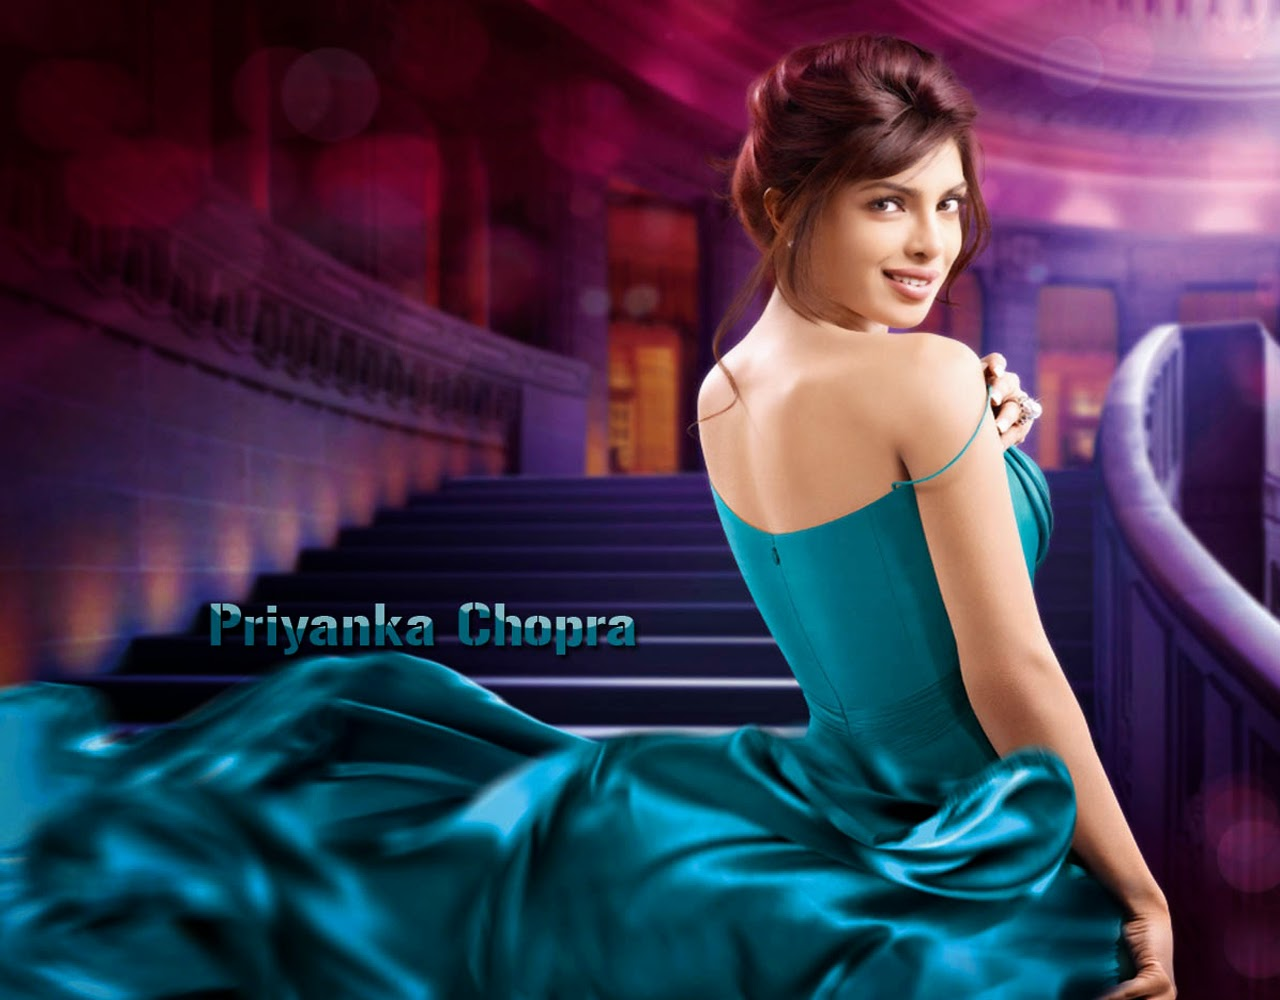 Global Pictures Gallery Priyanka Chopra Full Hd Wallpaers-6604